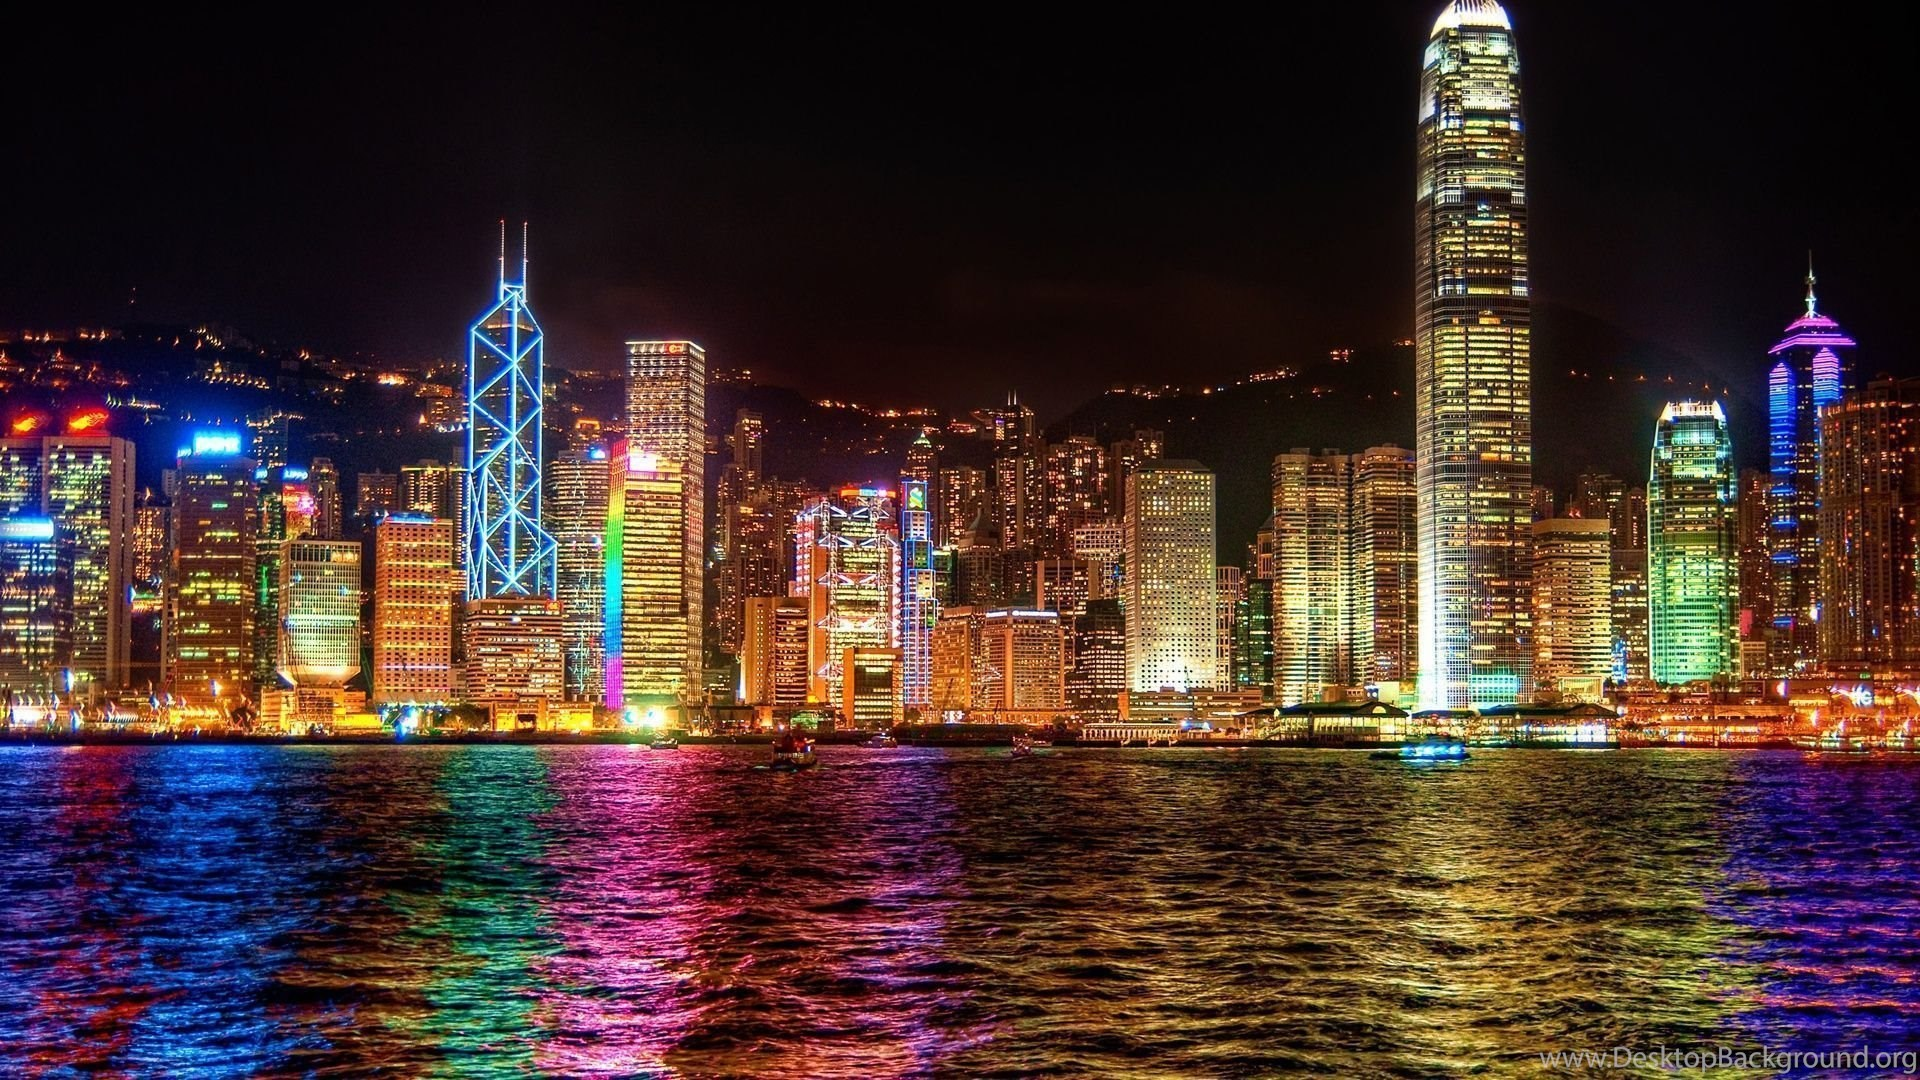 Night City Lights Wallpaper Hd Desktop Background